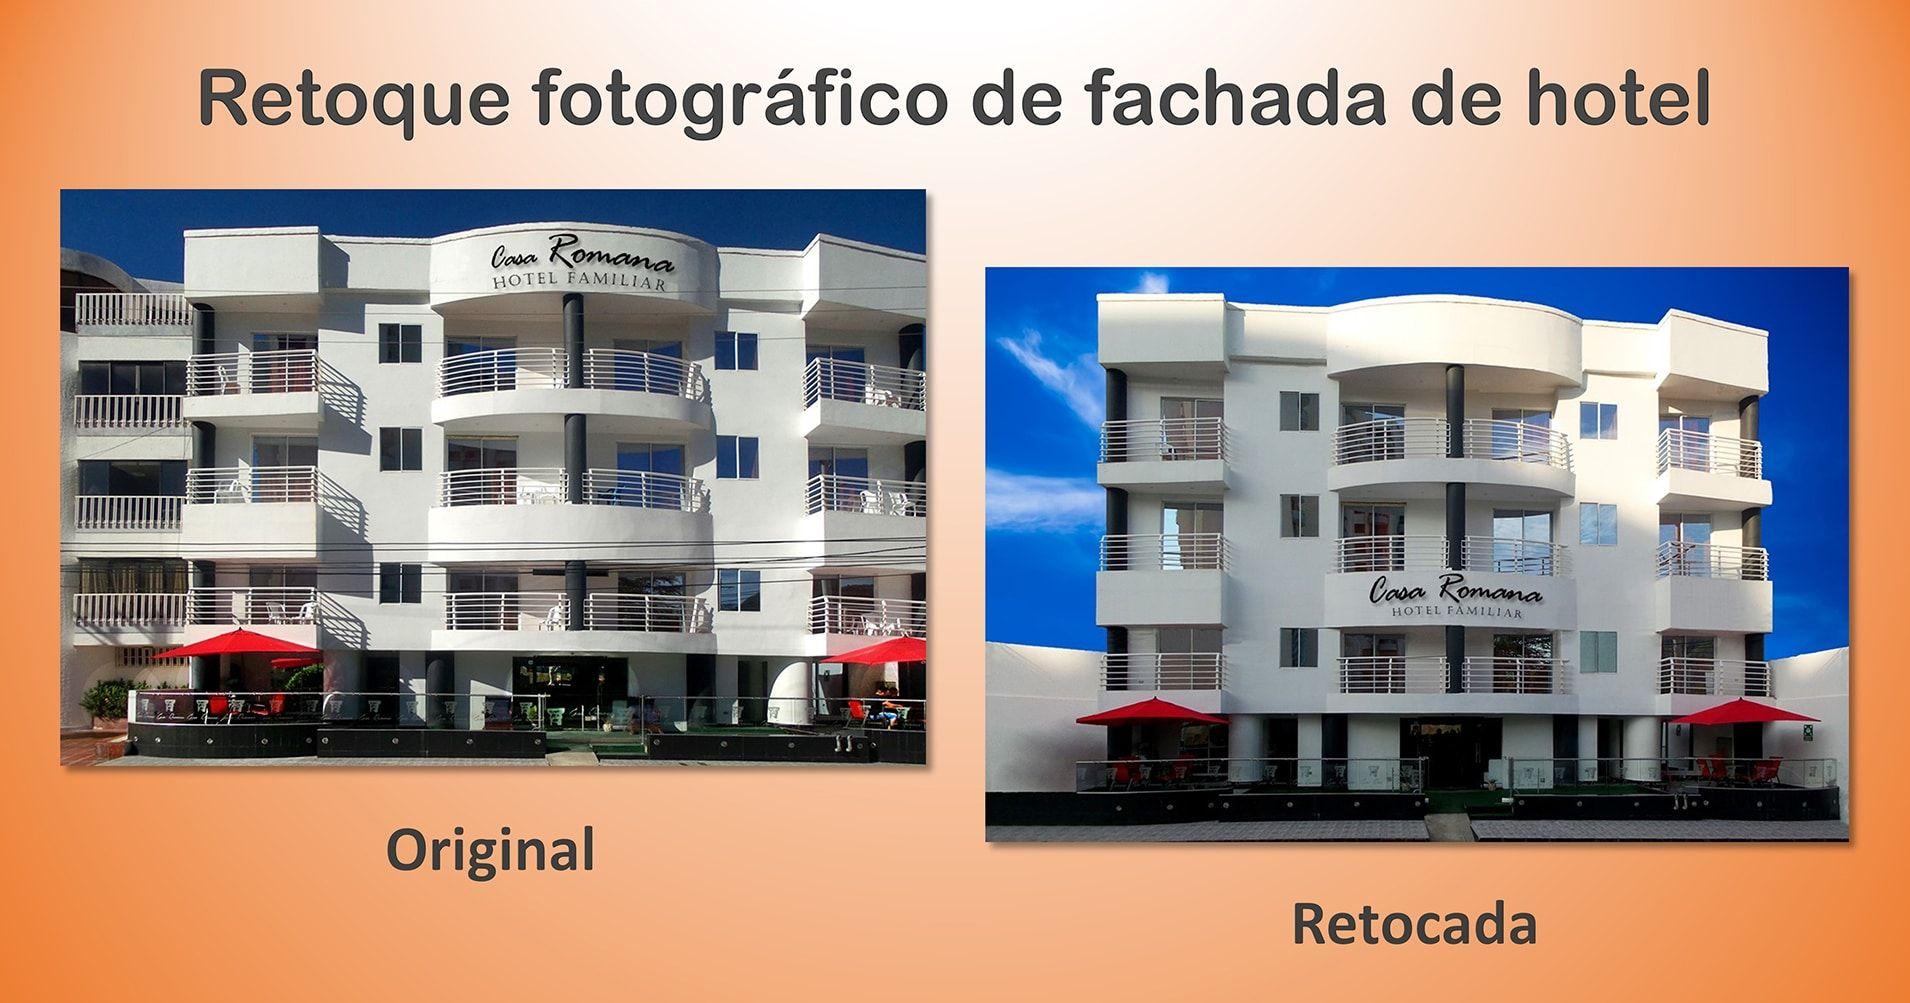 retoque-fotográfico-de-fachada-hotel-casa-romana-1910x1000